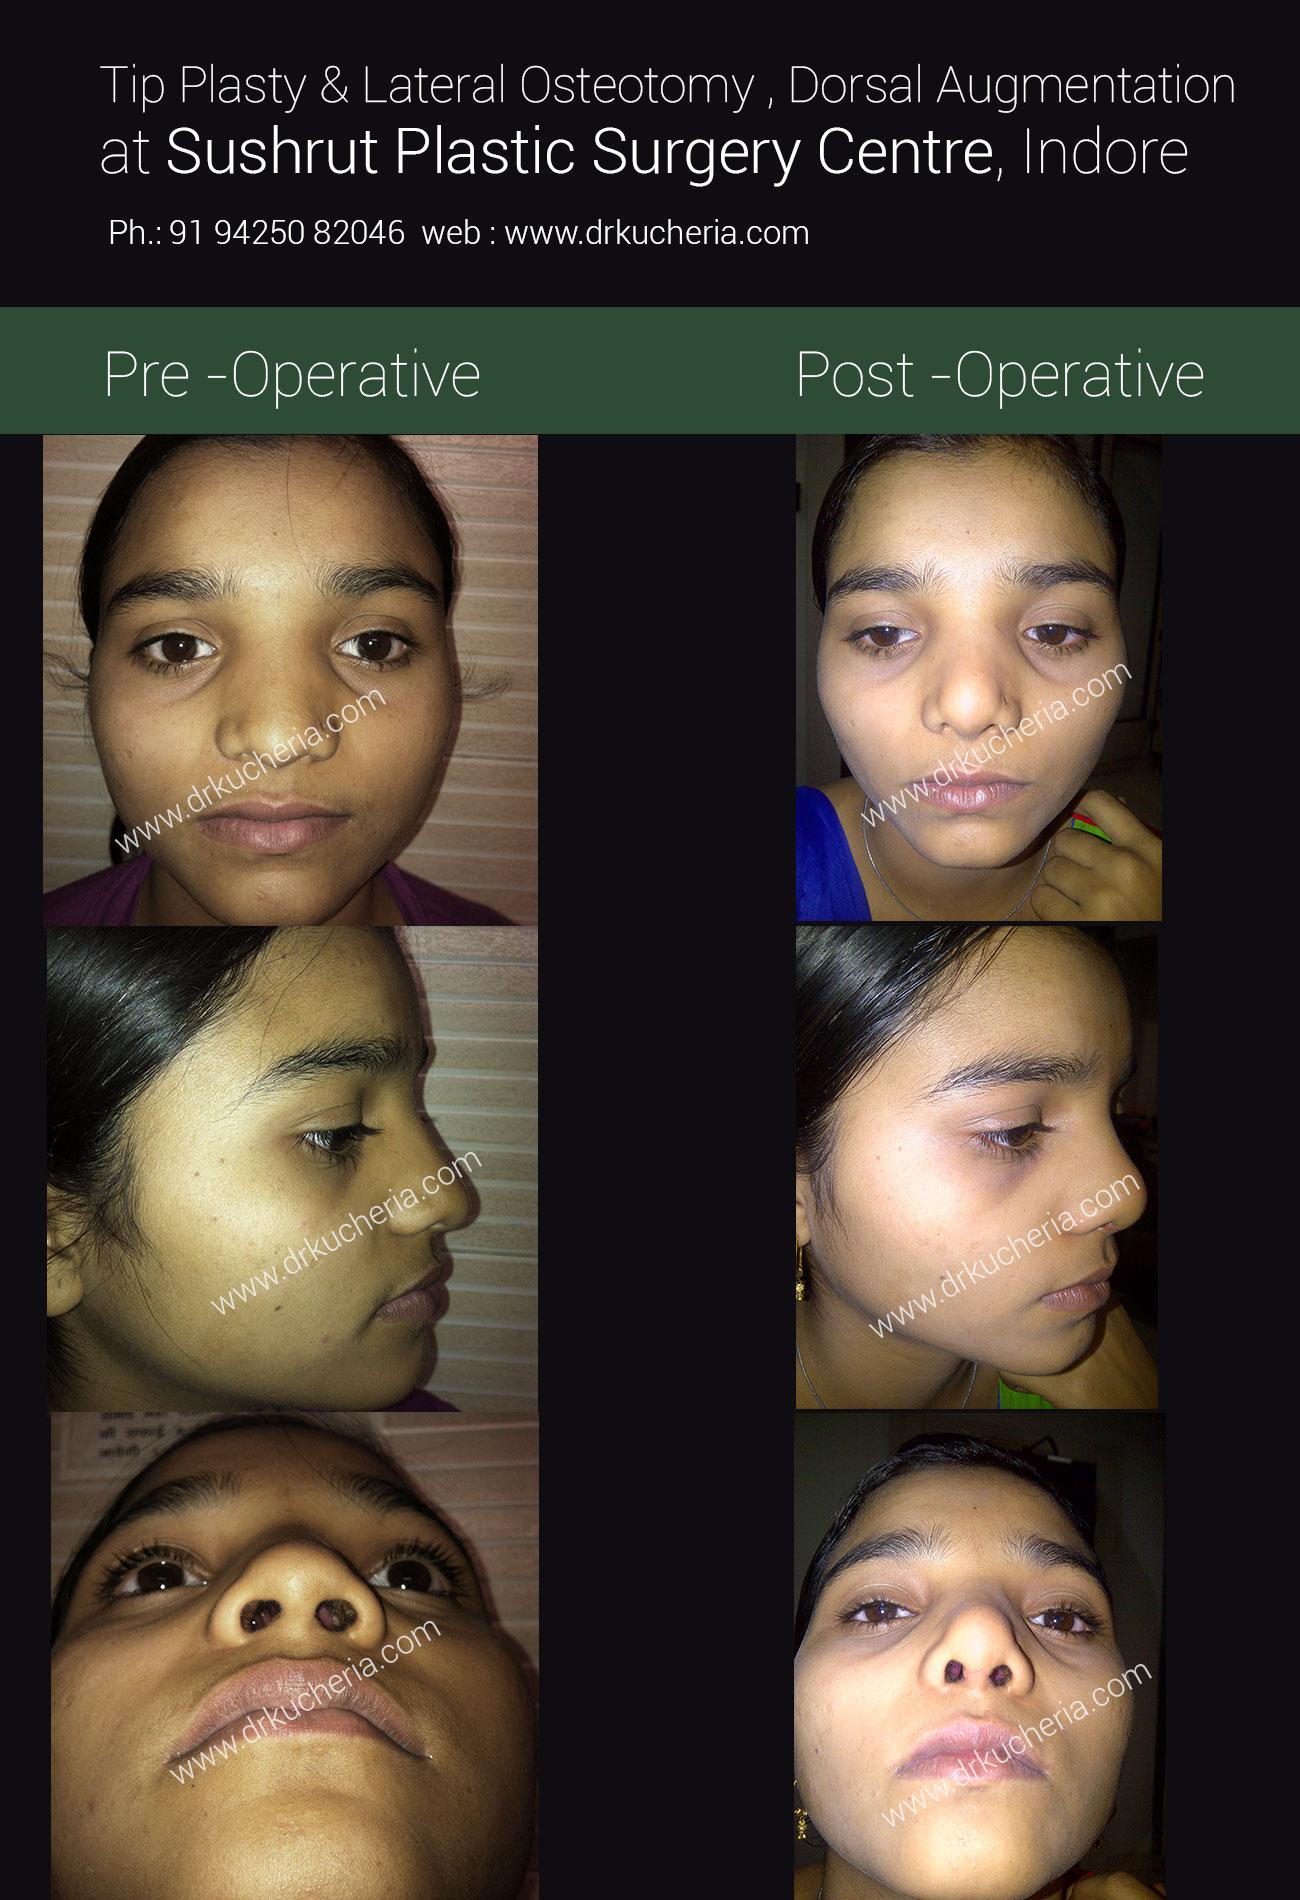 tip-plasty-&-lateral-osteotomy-dorsal-augmentation